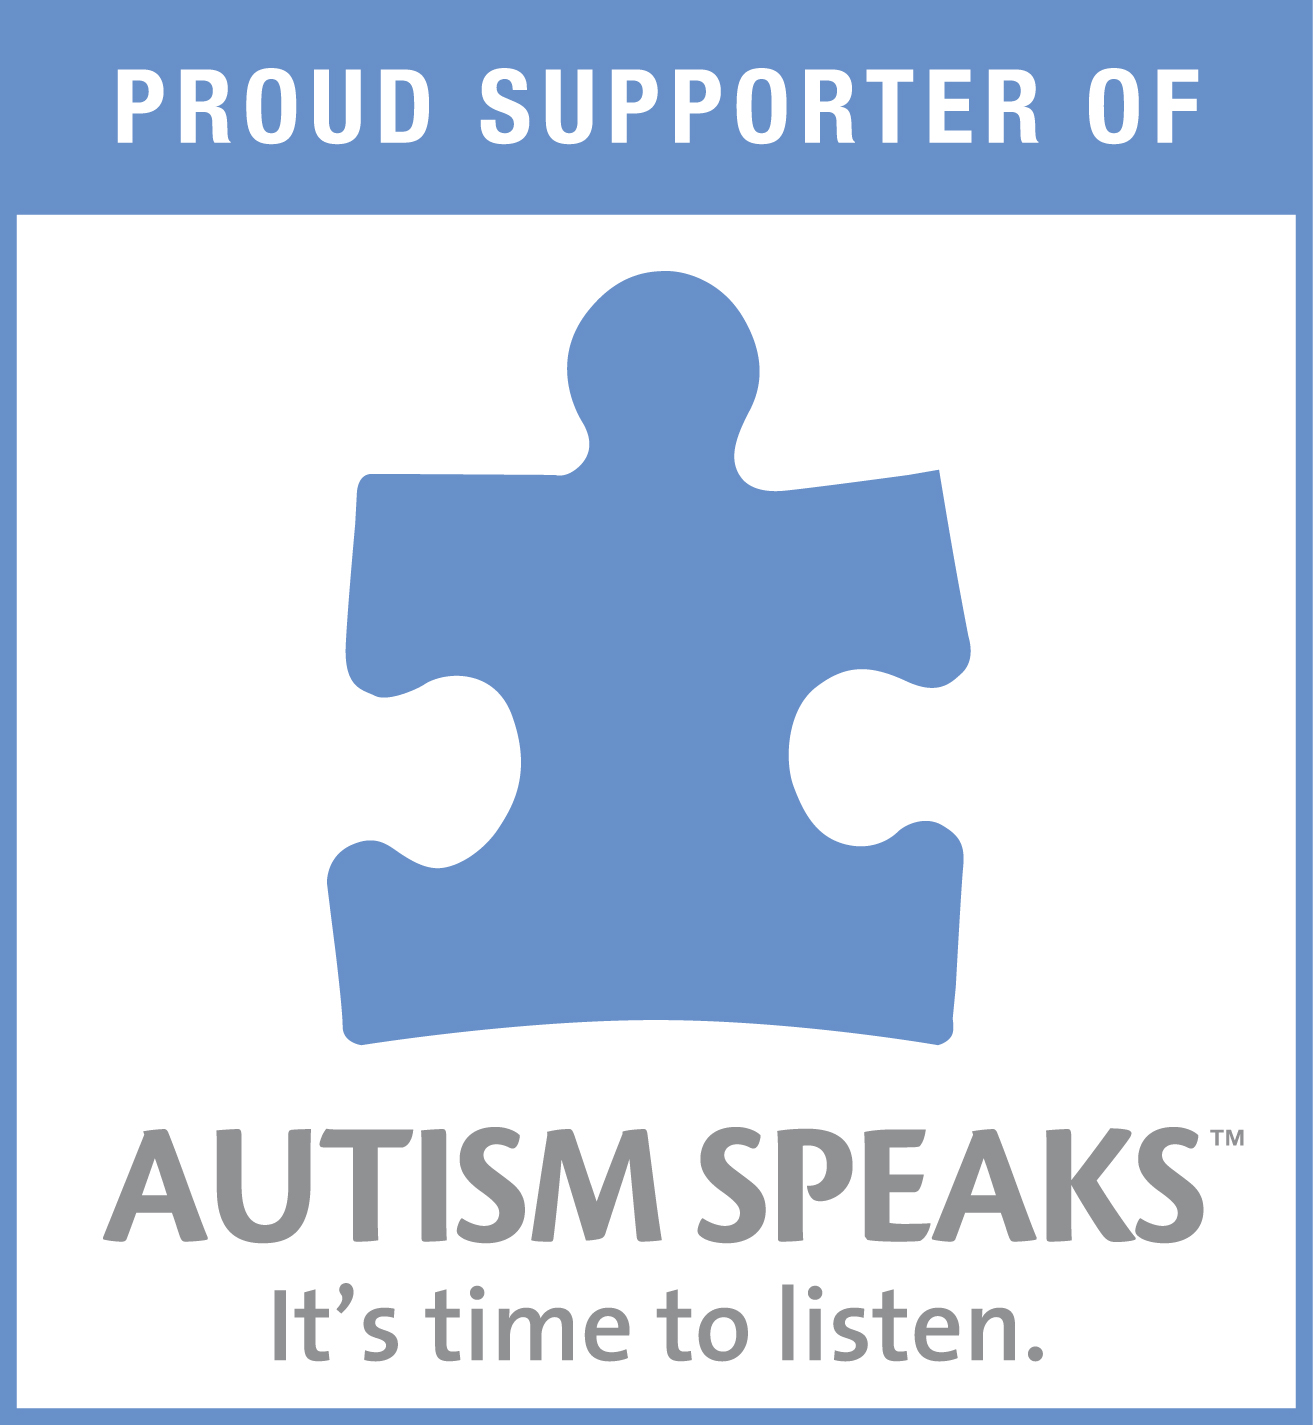 Autism-Speaks-Proud-Supporter_2C.jpg